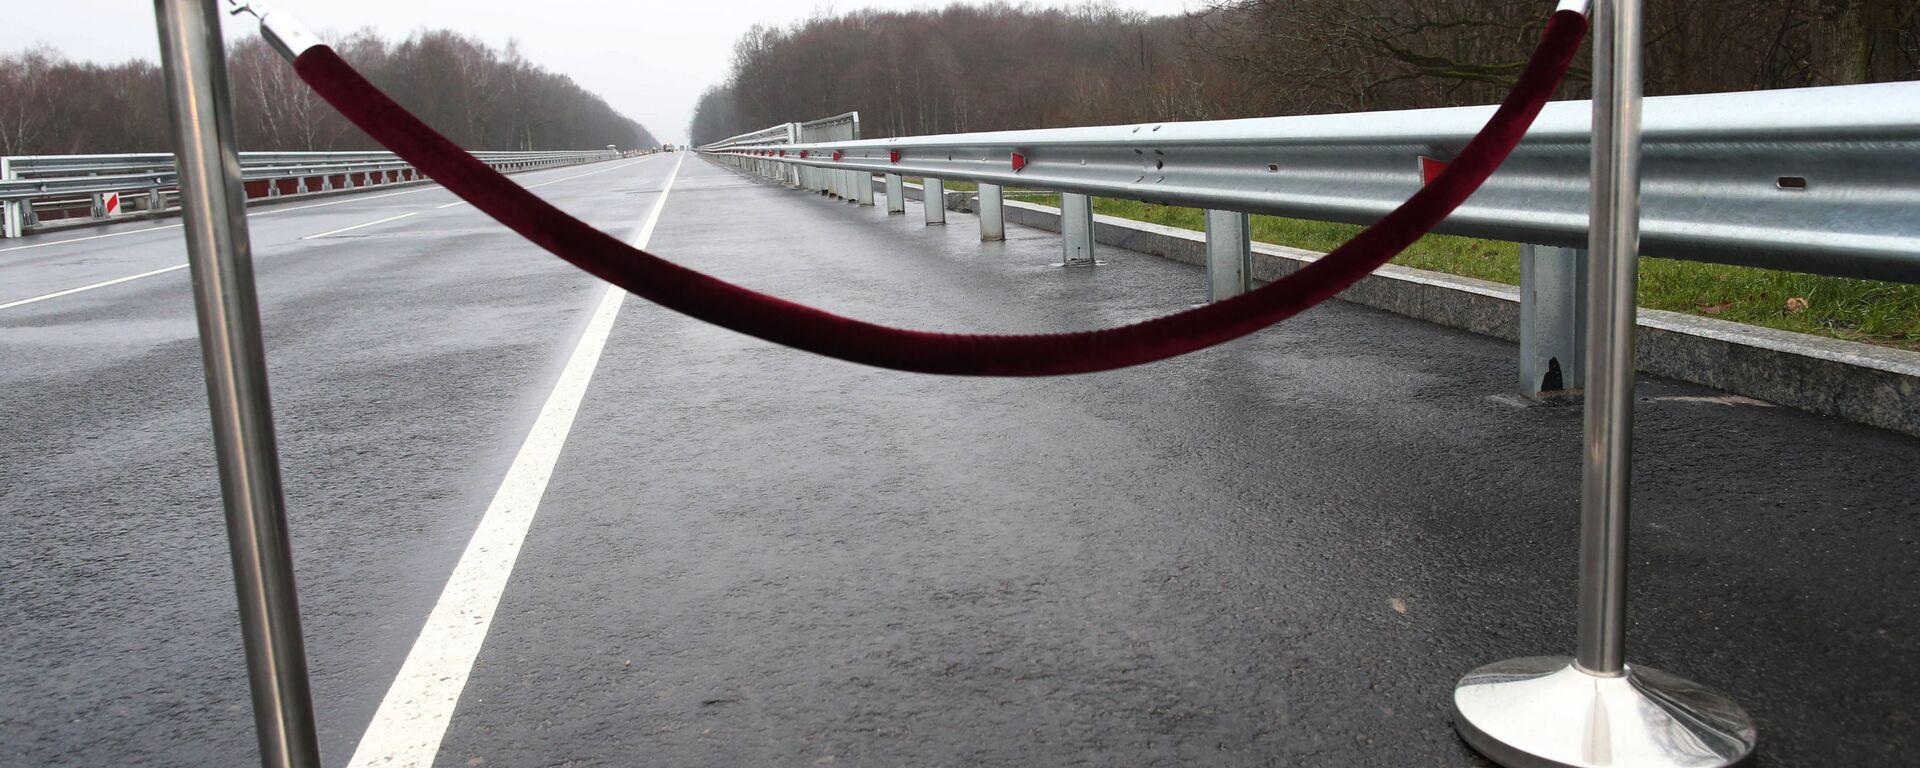 Most na trasie Kaliningrad - Mamonowo - granica Polski  - Sputnik Polska, 1920, 07.02.2021